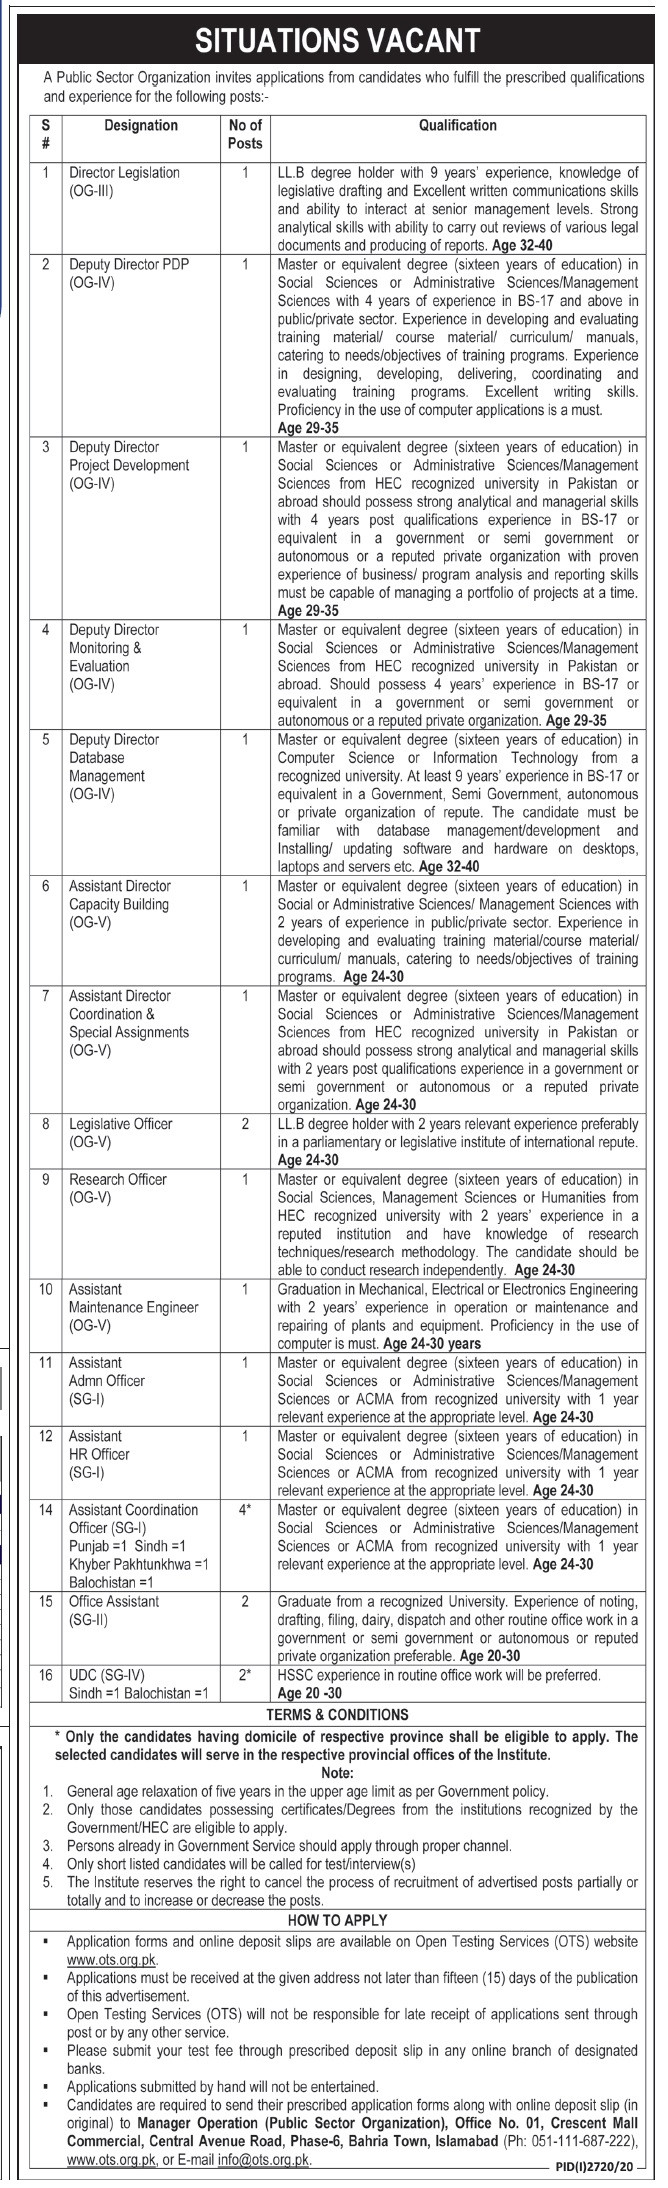 Public Sector Organization Islamabad Jobs Nov 2020 Deputy Director